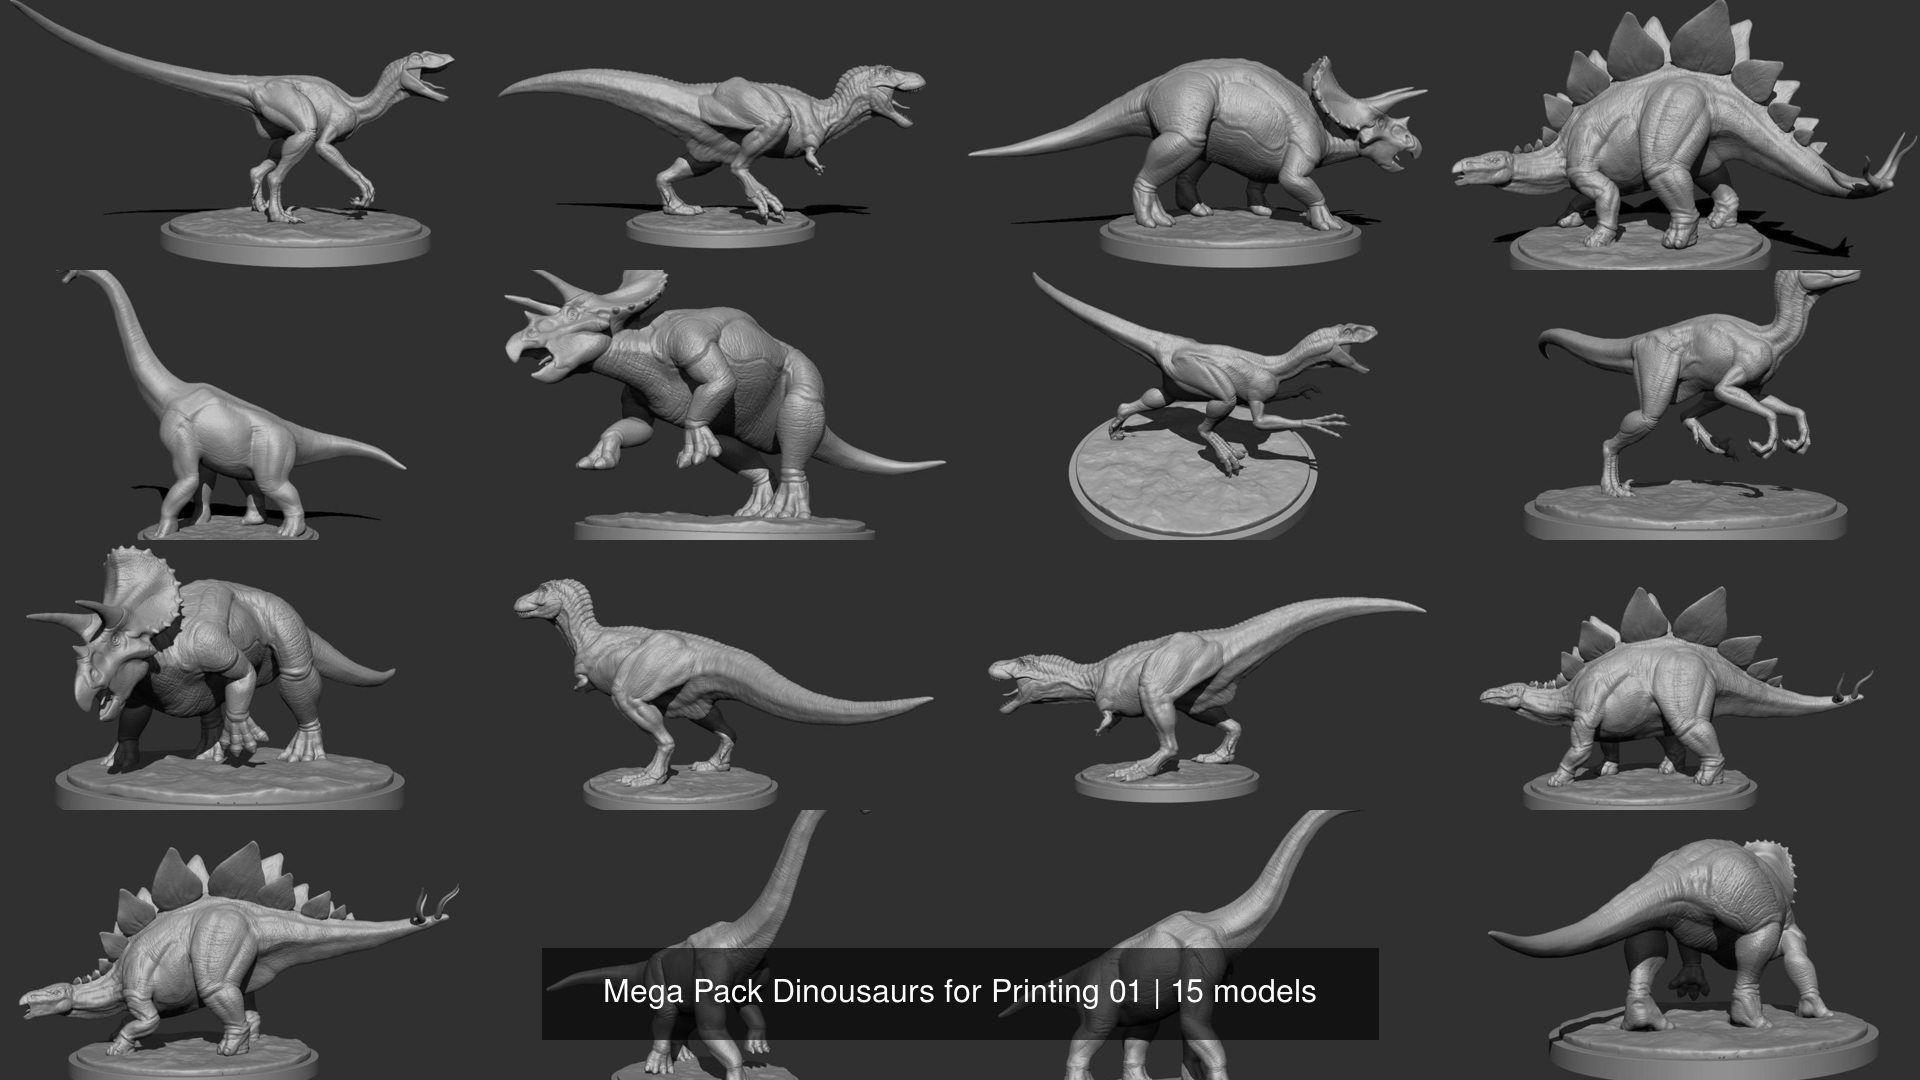 Mega Pack Dinousaurs for Printing 01